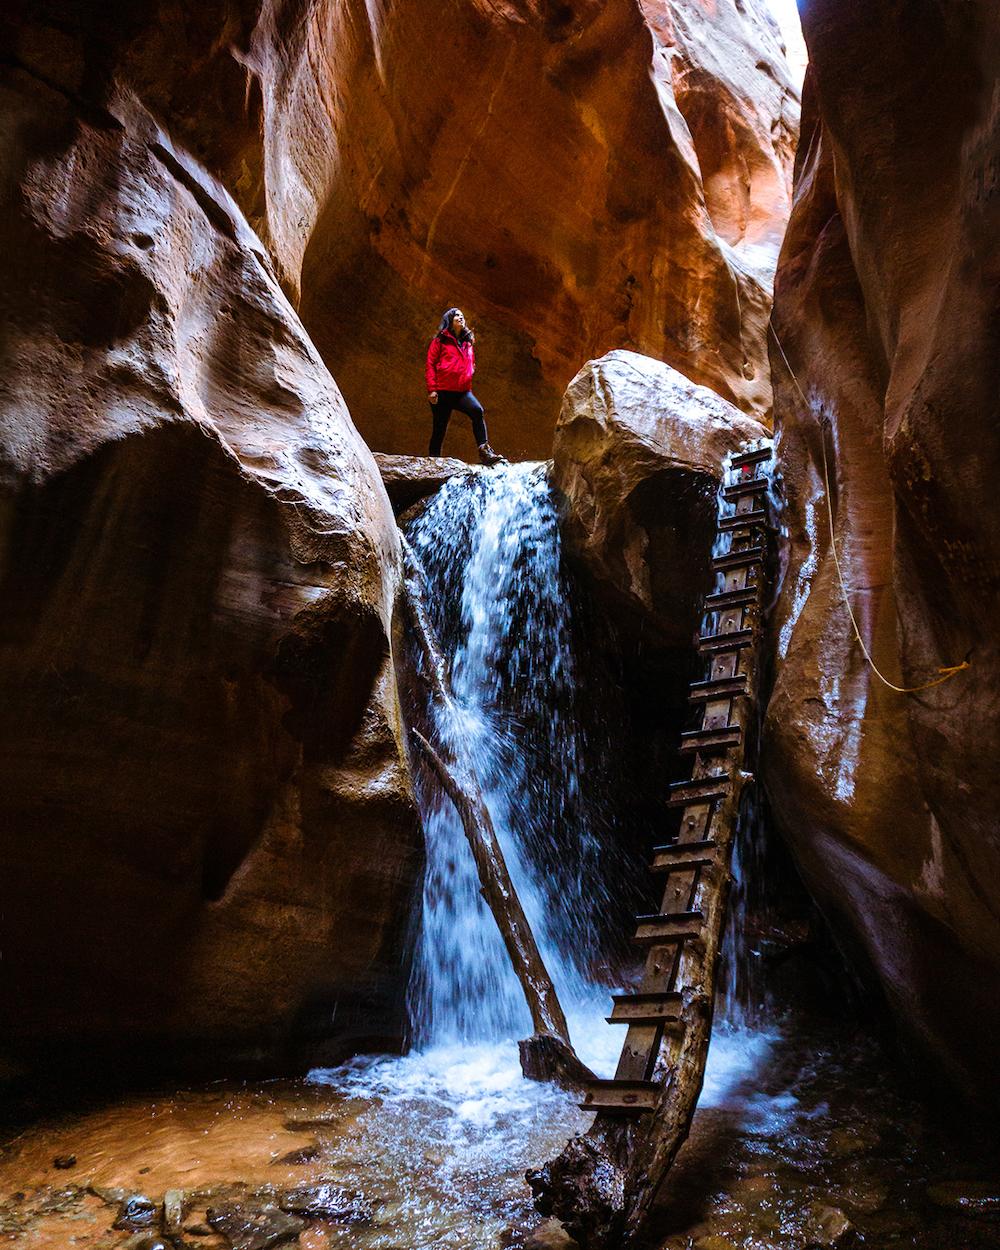 kanarra falls hike utah kanarraville creek